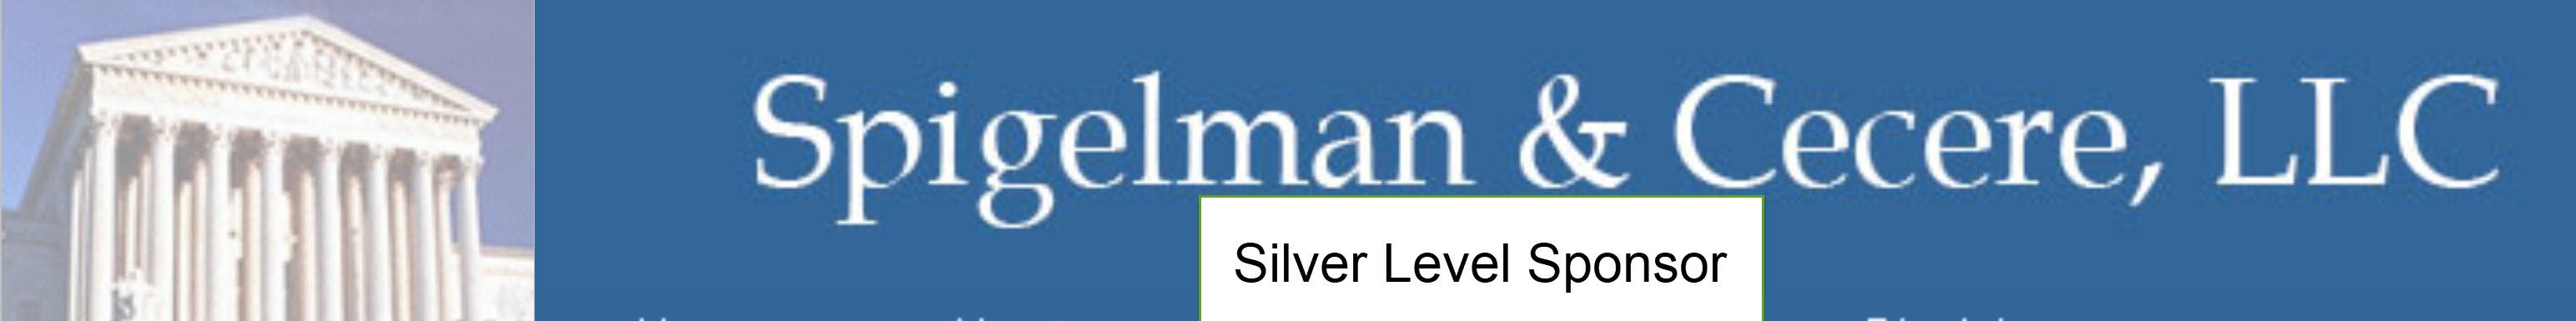 Spigelman & Cecere, LLC